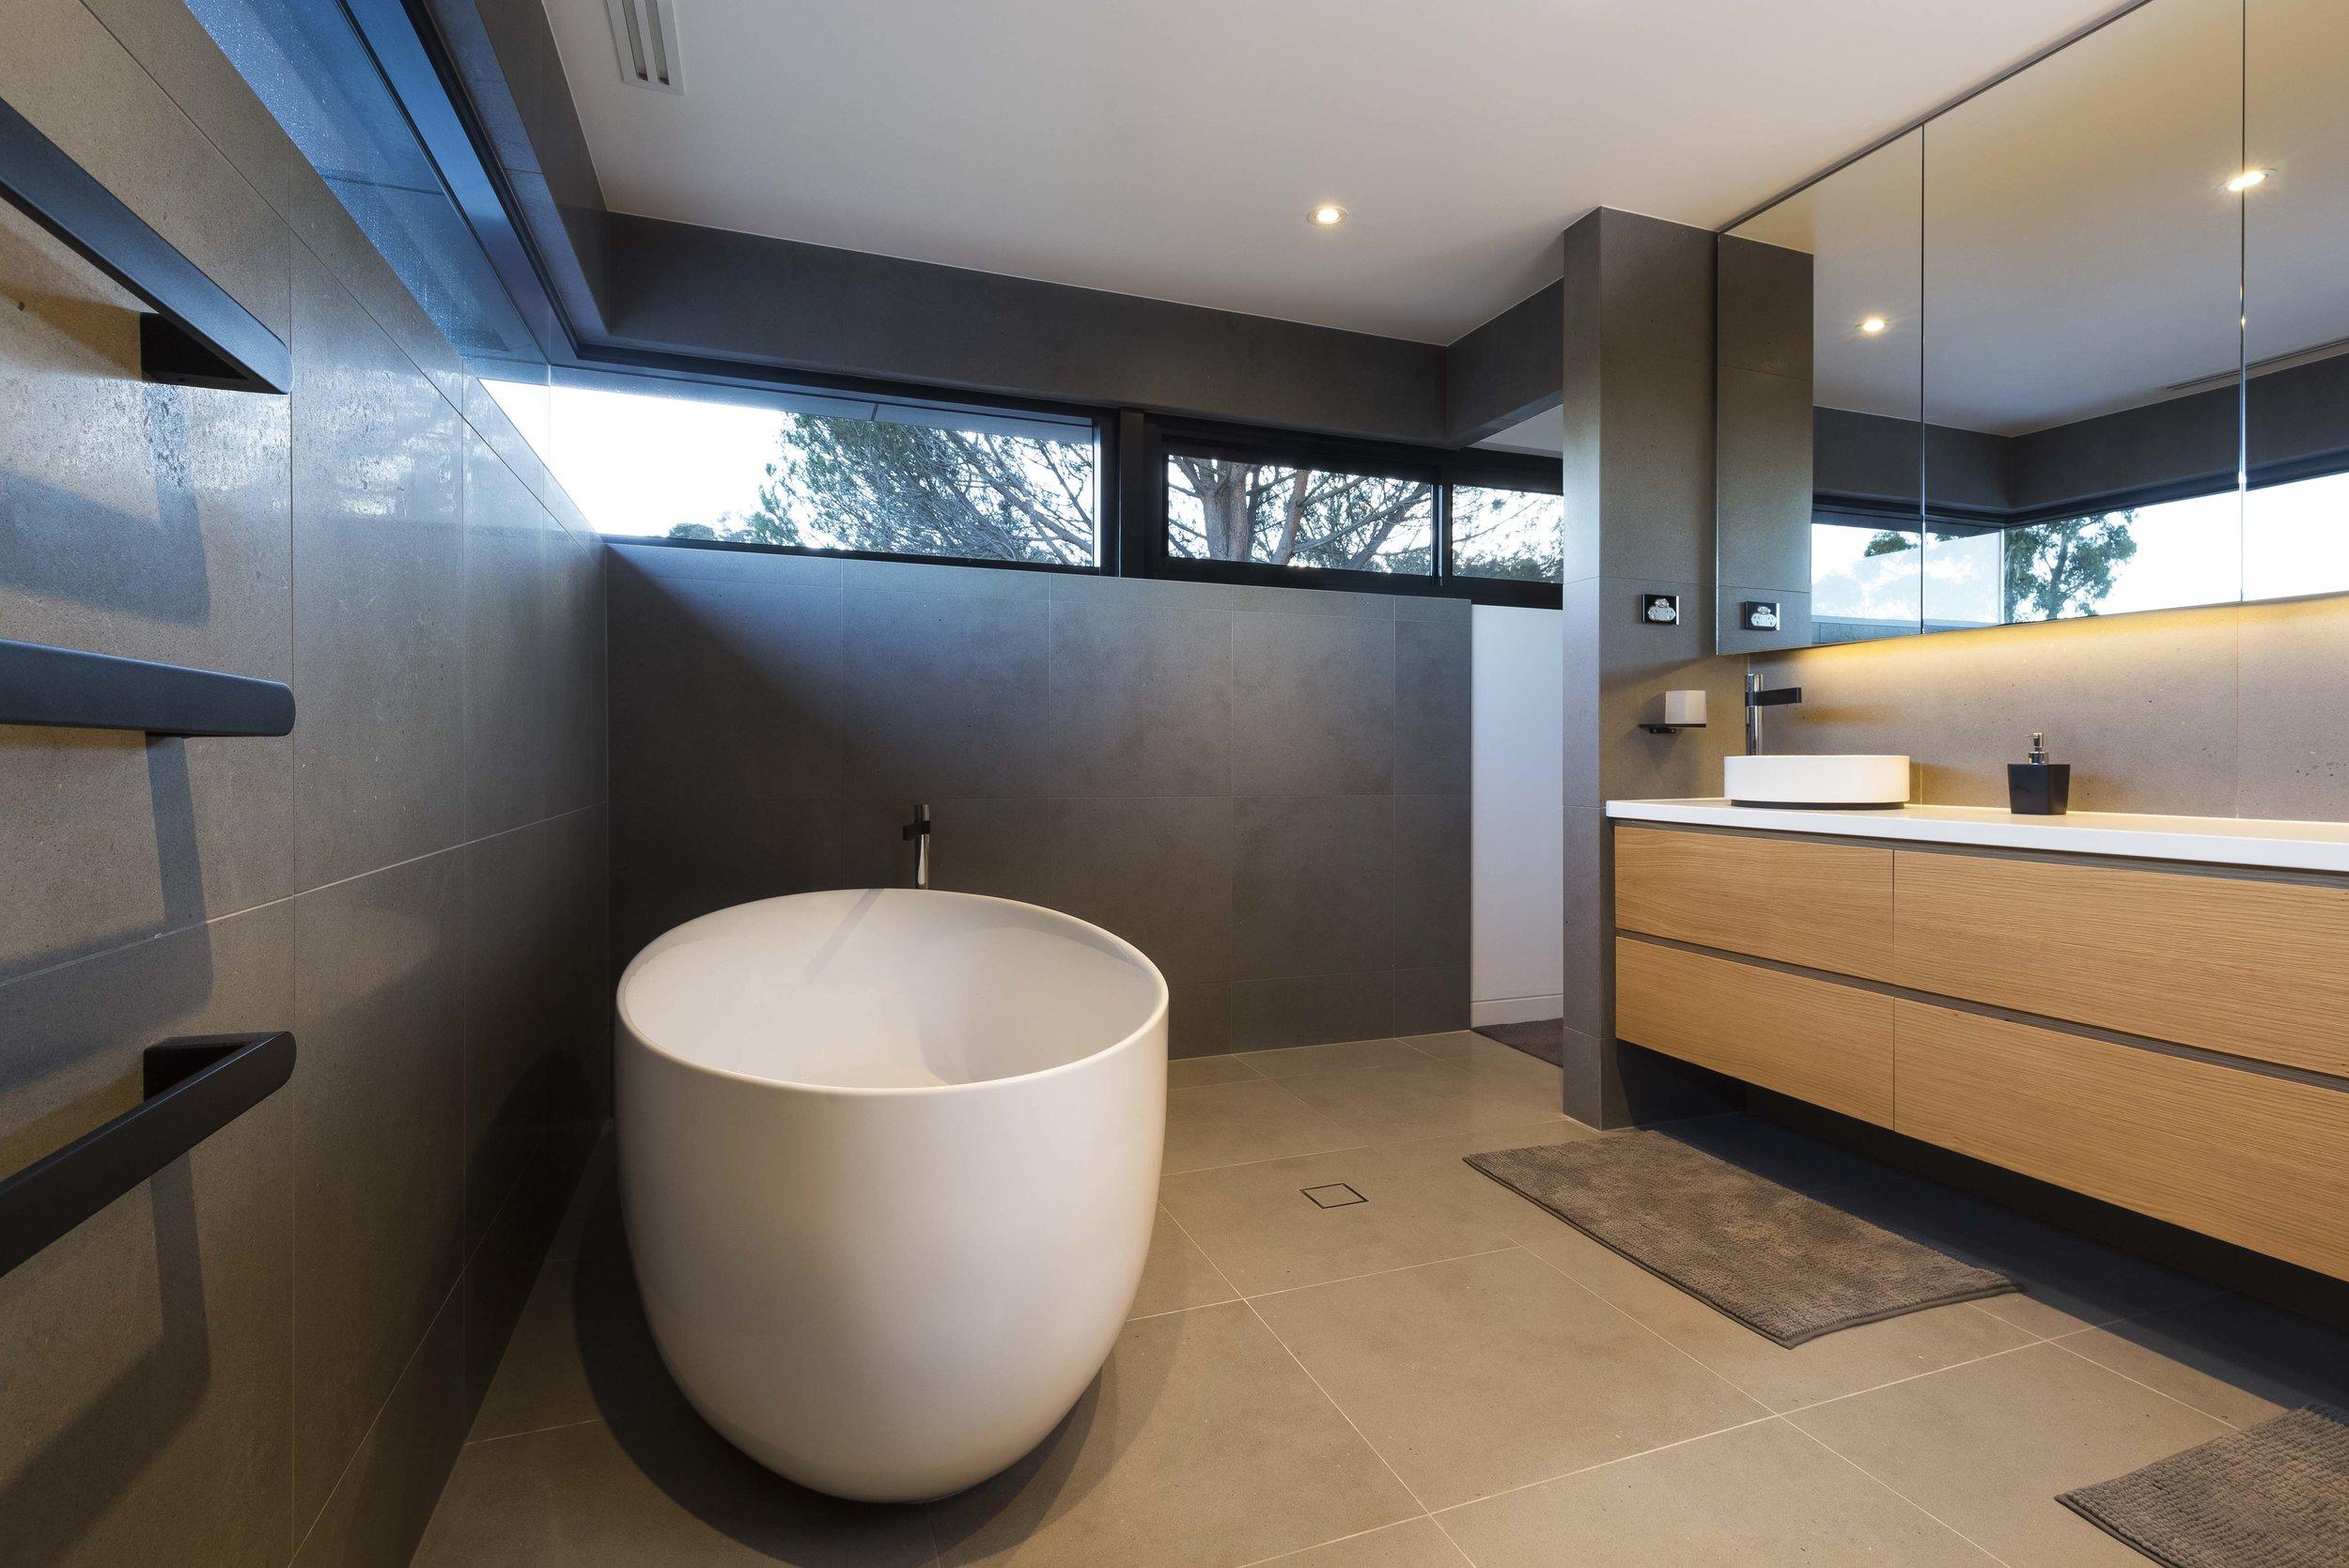 marina-mcdonald-architectural-photography-canberra-adam-hobill-bathroom-bath